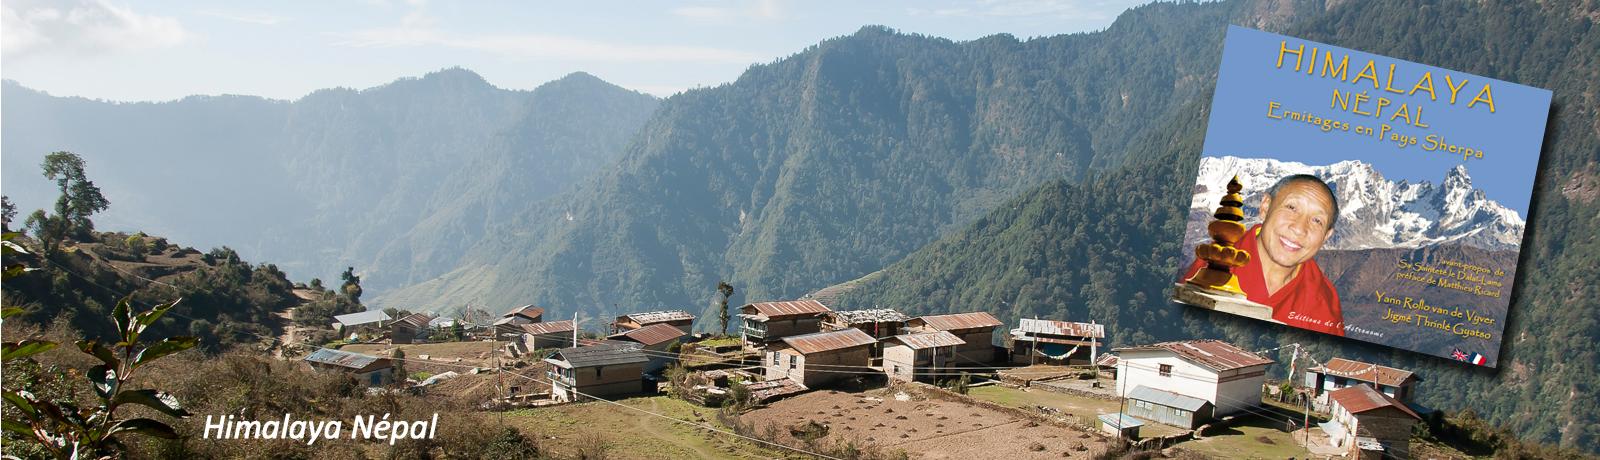 accueil_himalya nepal